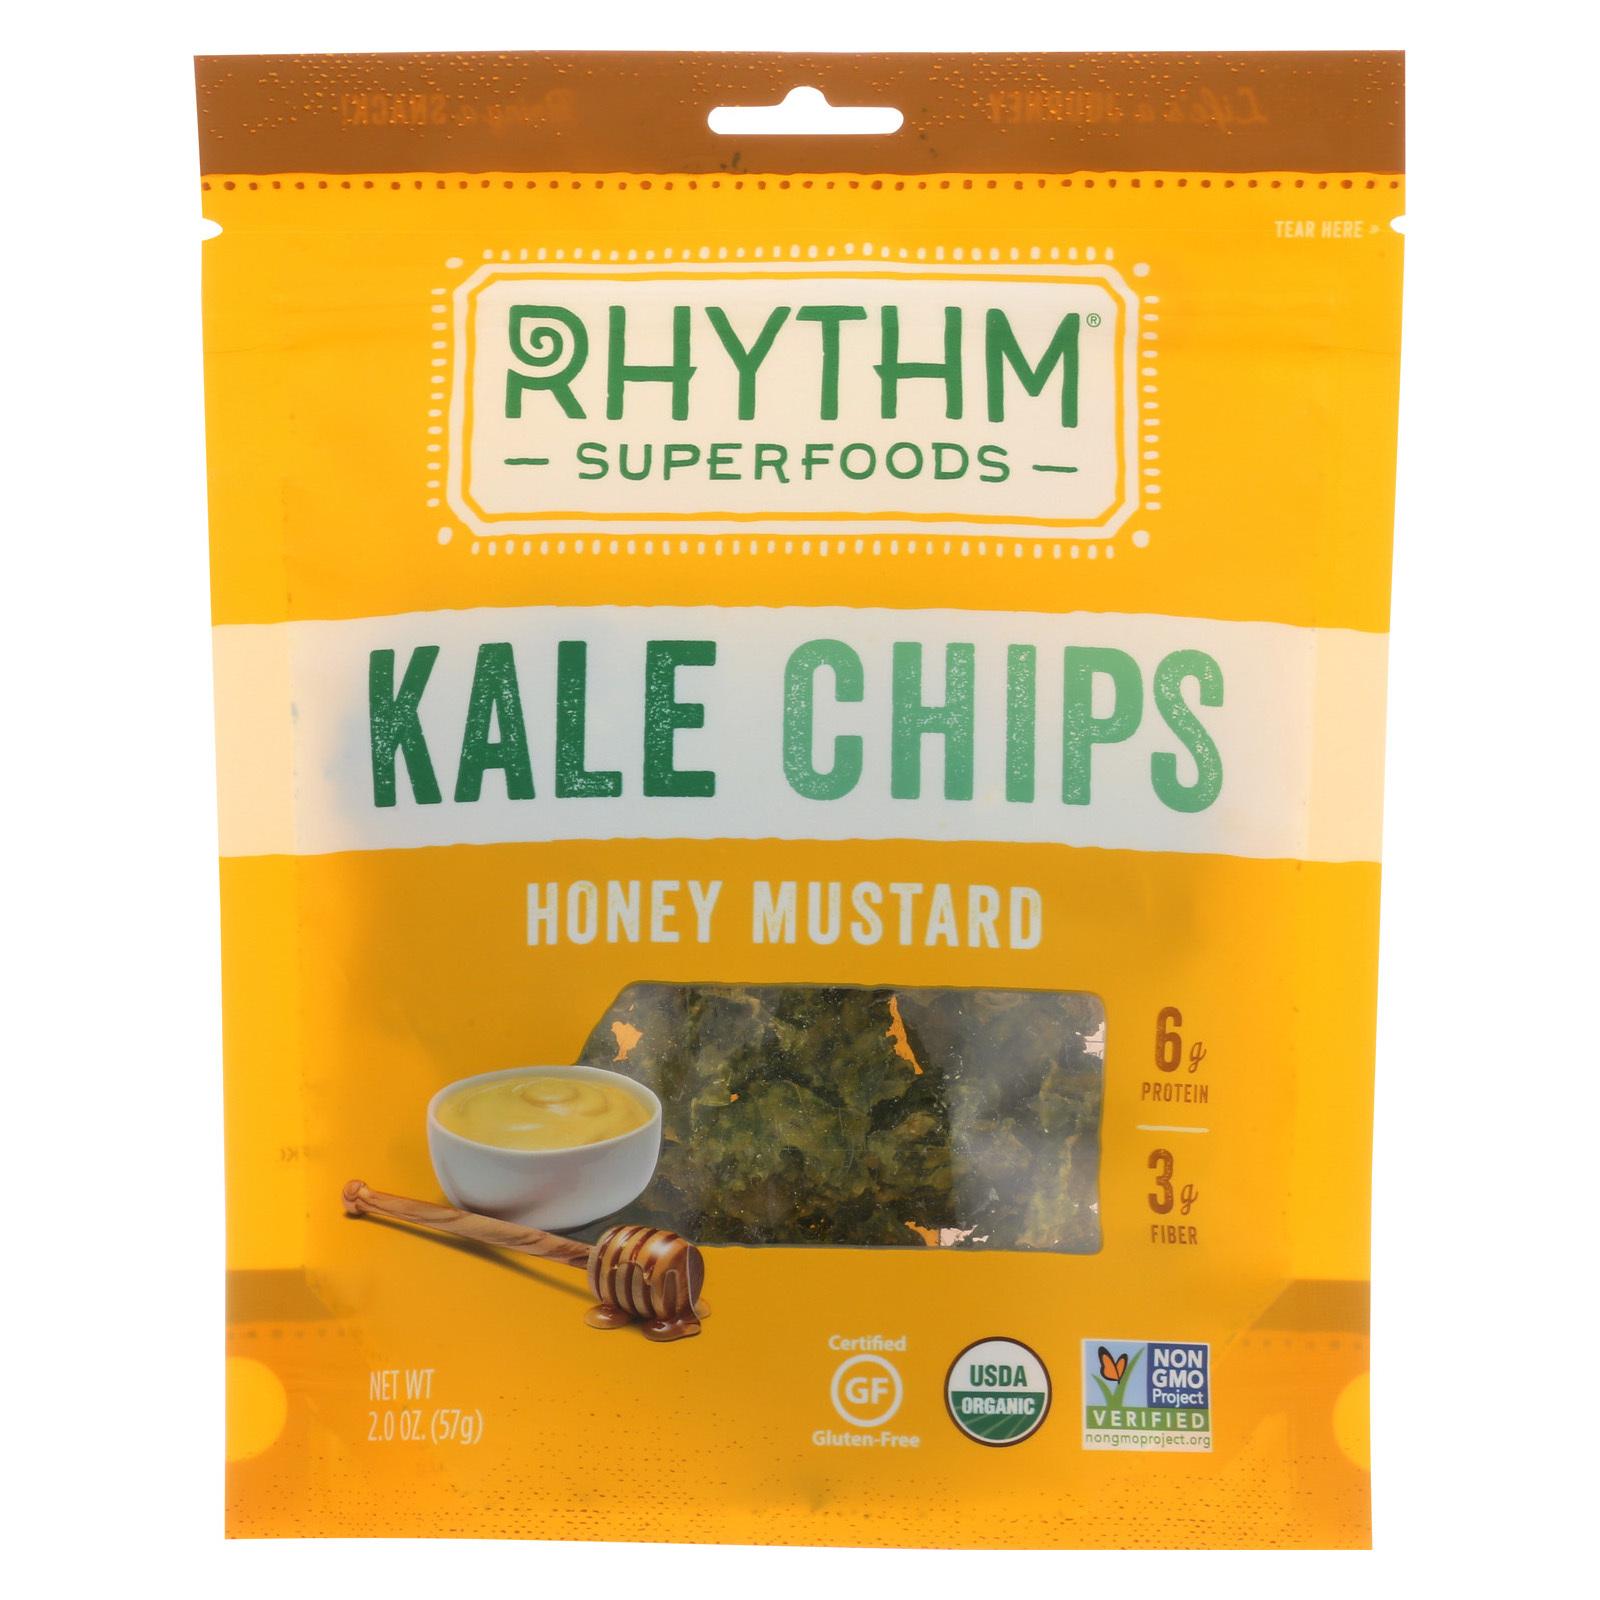 Rhythm Superfoods Kale Chips - Honey Mustard - Case of 12 - 2 oz.